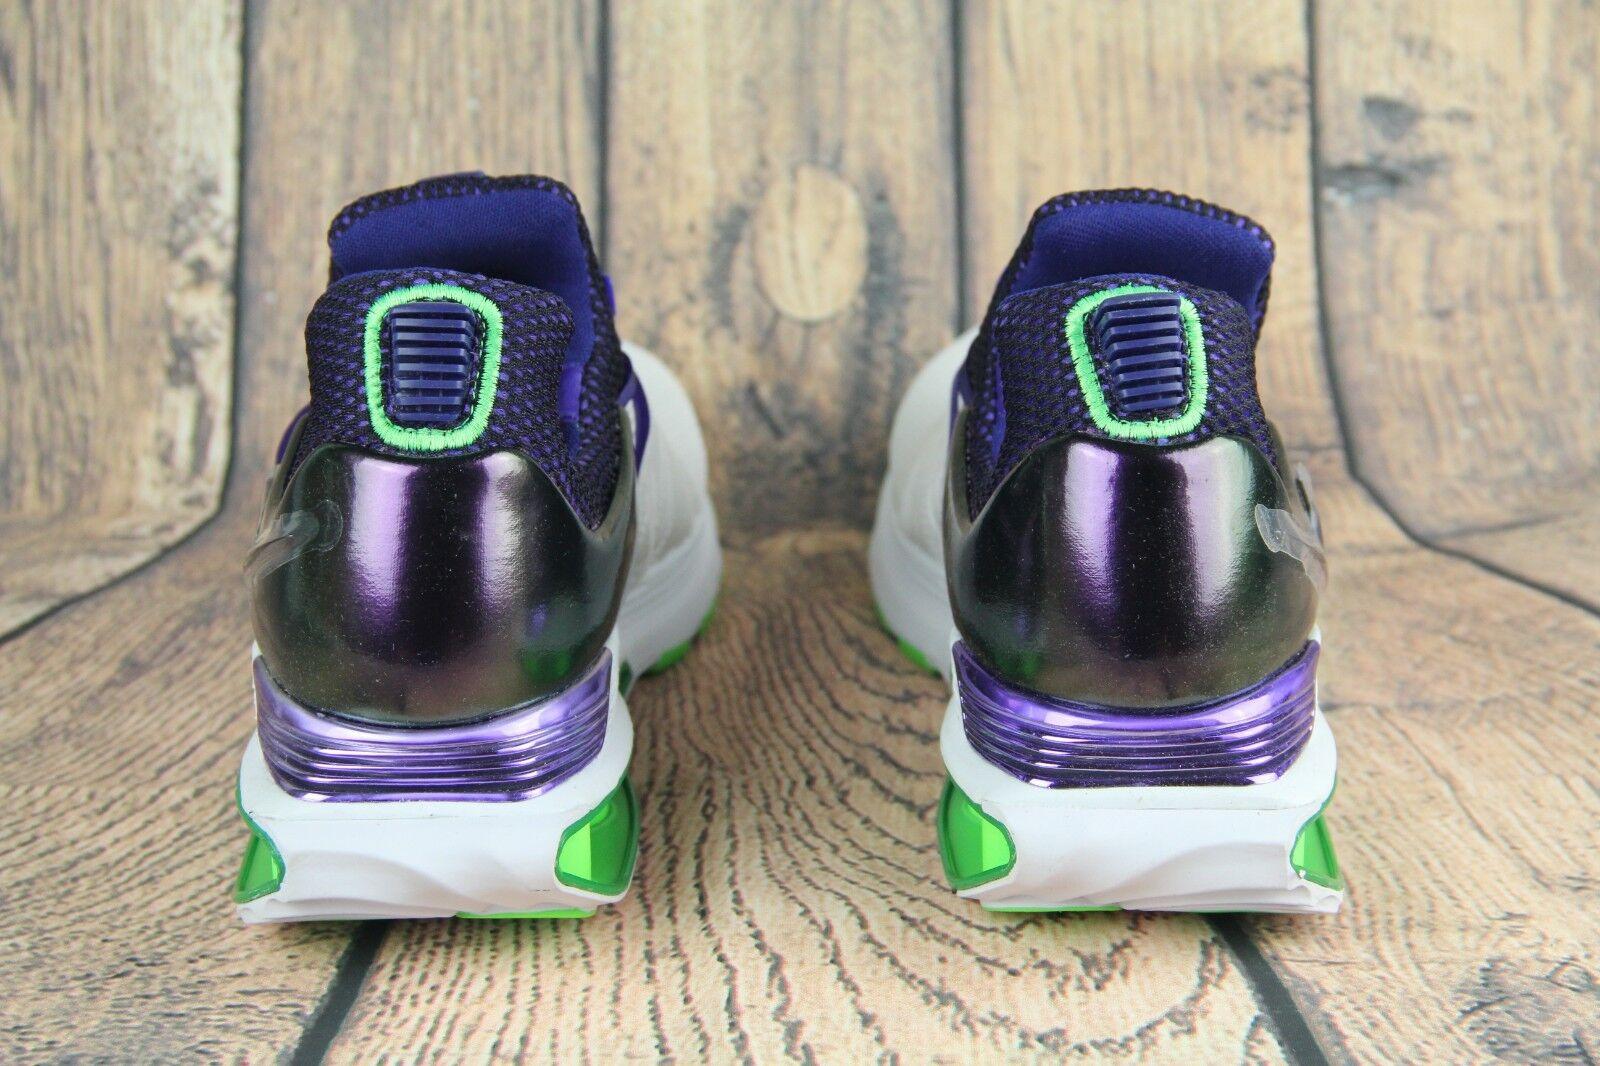 Nike shox schwere turnschuhe, weiße fusion violet violet violet wut grüne aq8554-105 frauen sz fe3040